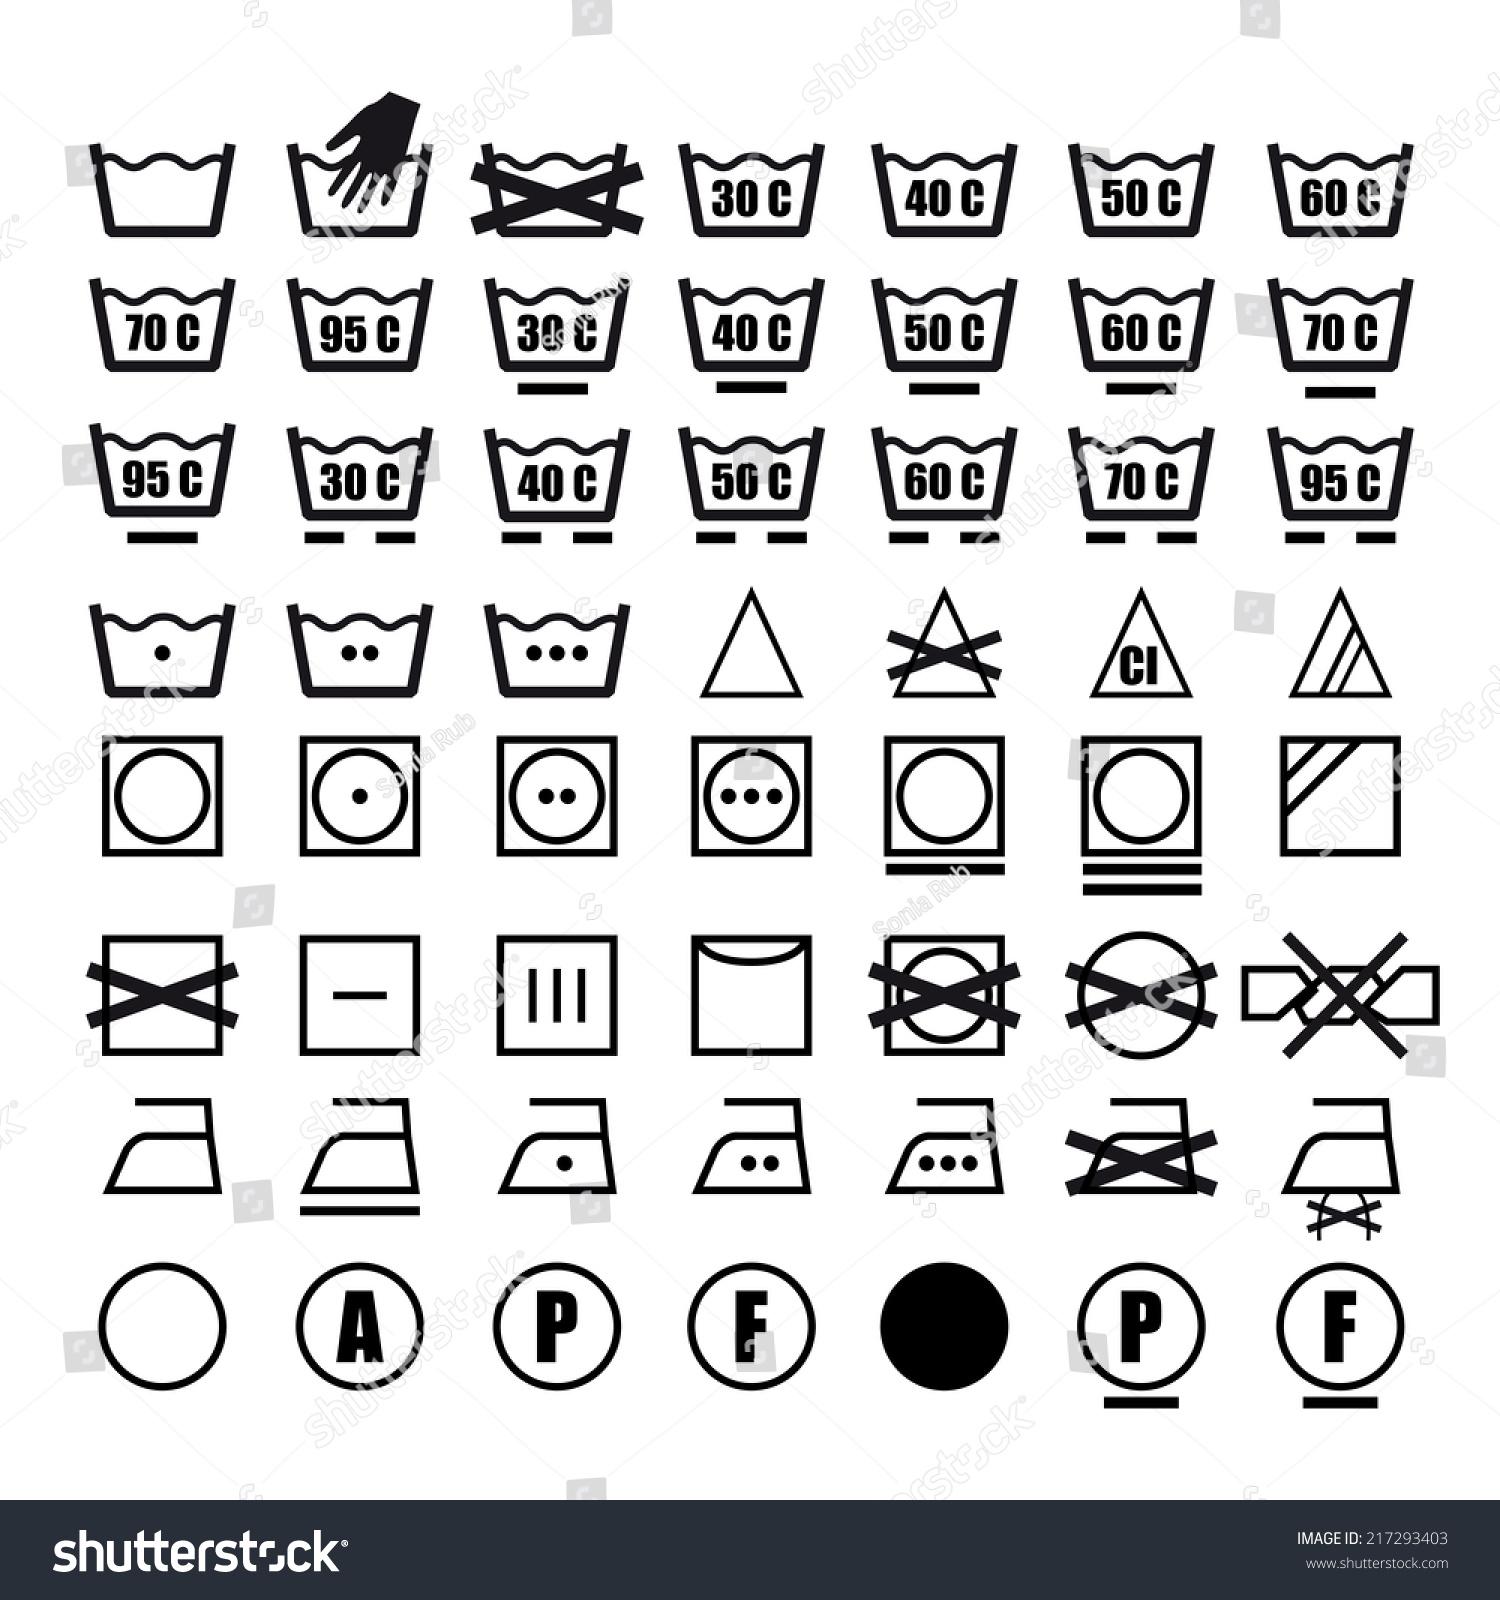 Royalty Free Vector Icon Set Of Washing Symbols 217293403 Stock